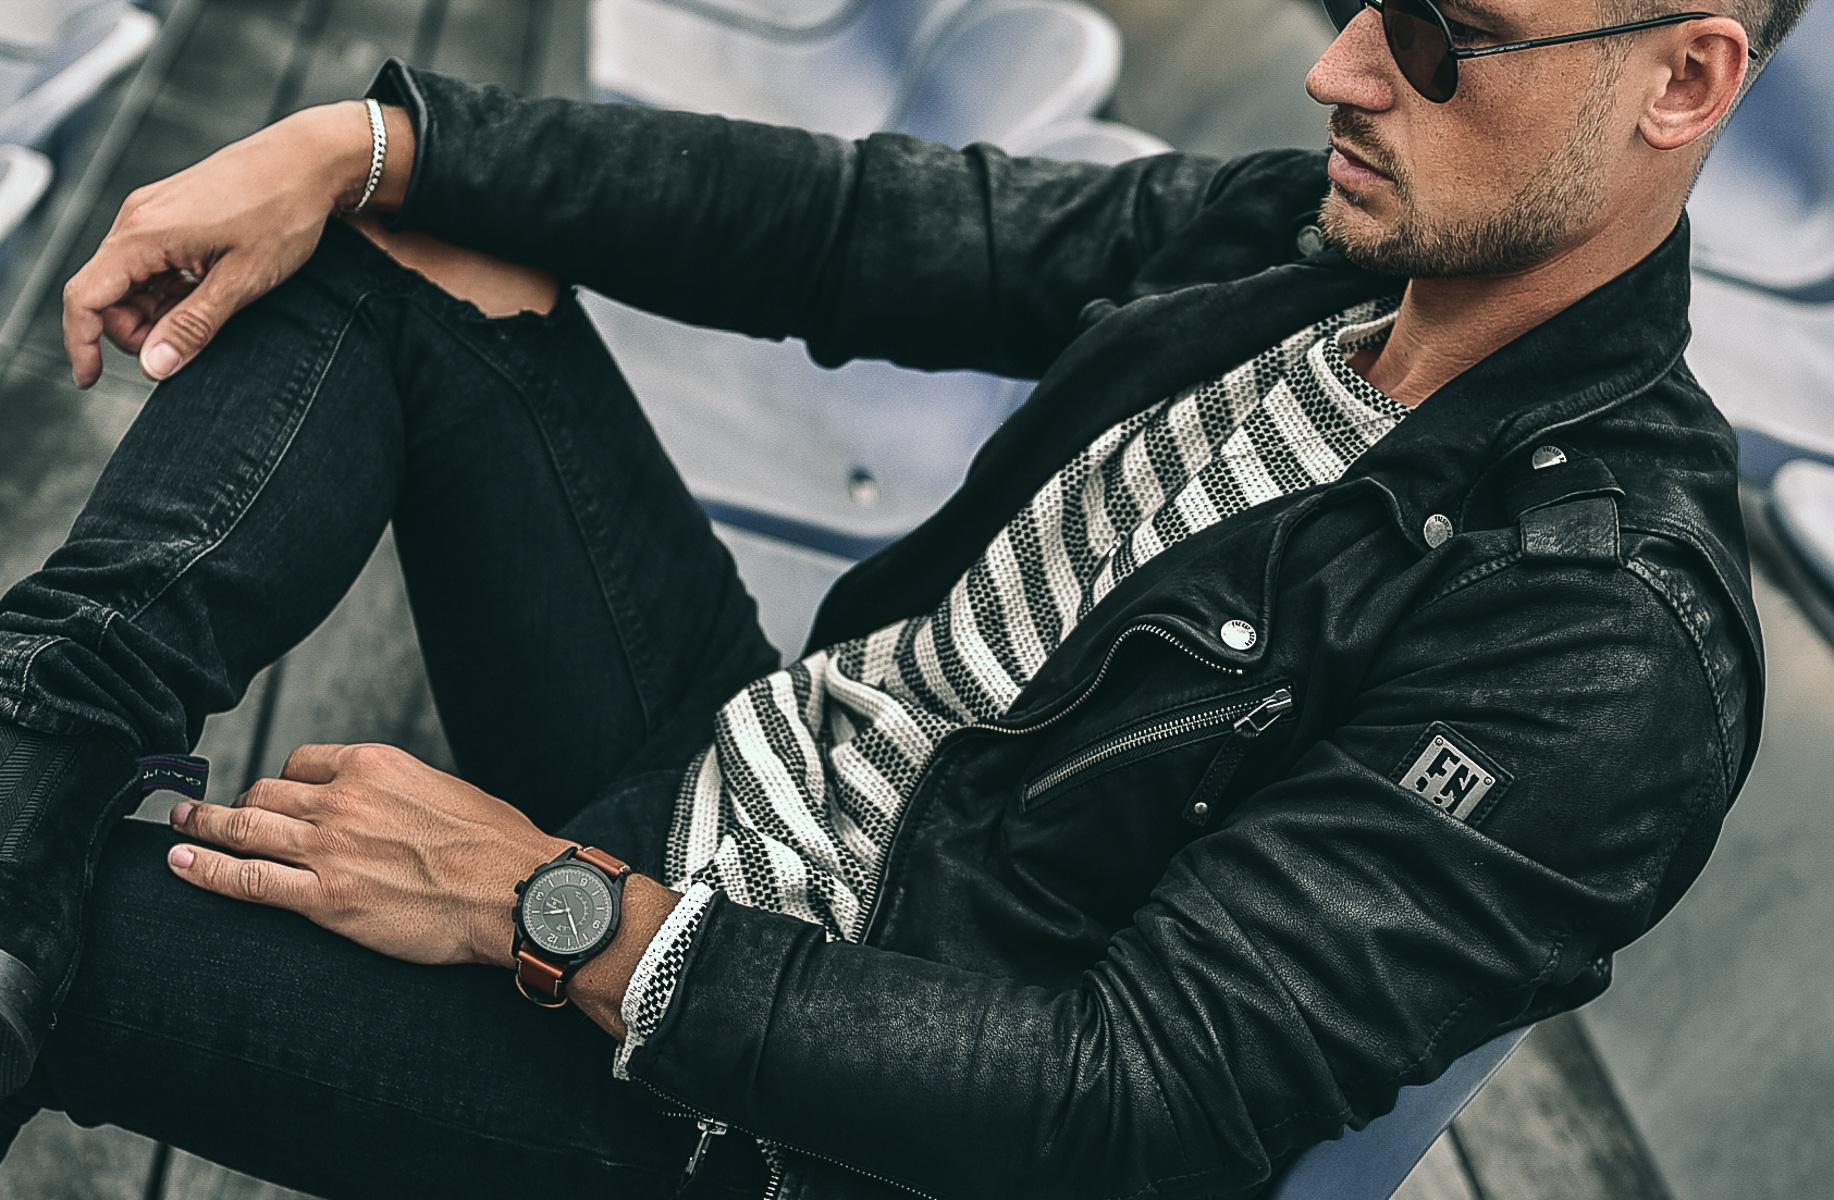 Tommeezjerry-Maennermodeblog-Maennermode-Fashionblog-Styleblog-Berlinblog--Lifestyleblog-Fossil-Hybrid-Q-Smartwatch-Bread-Butter-Lifestylewatch-Black-Outfit-Casual-Look